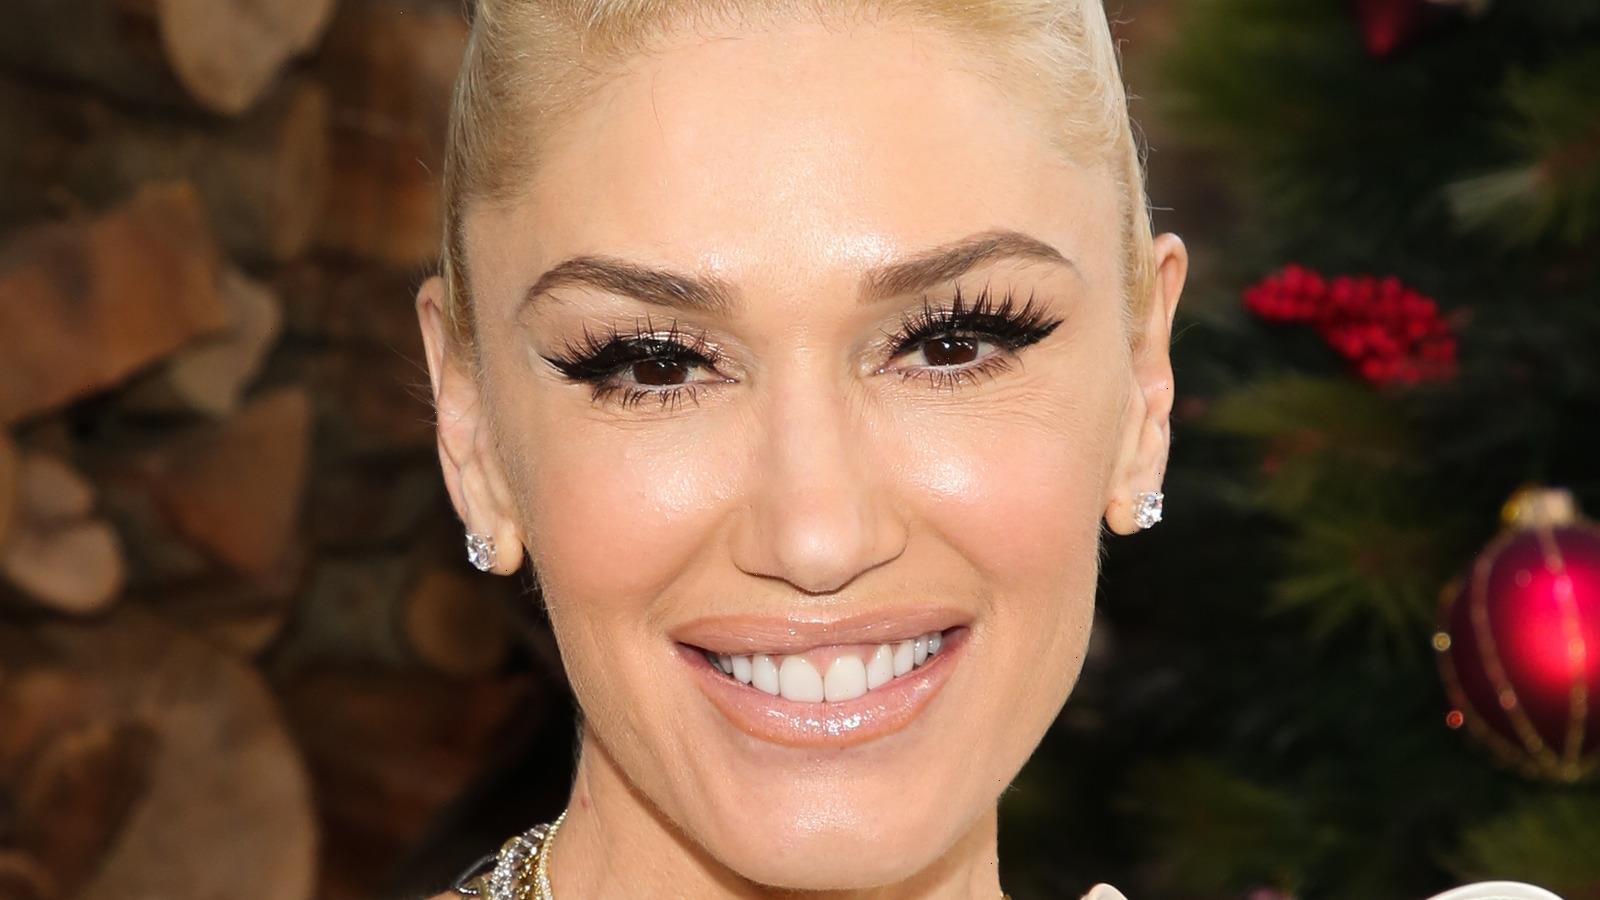 Blake Shelton And Gwen Stefani: Who Has The Higher Net Worth?